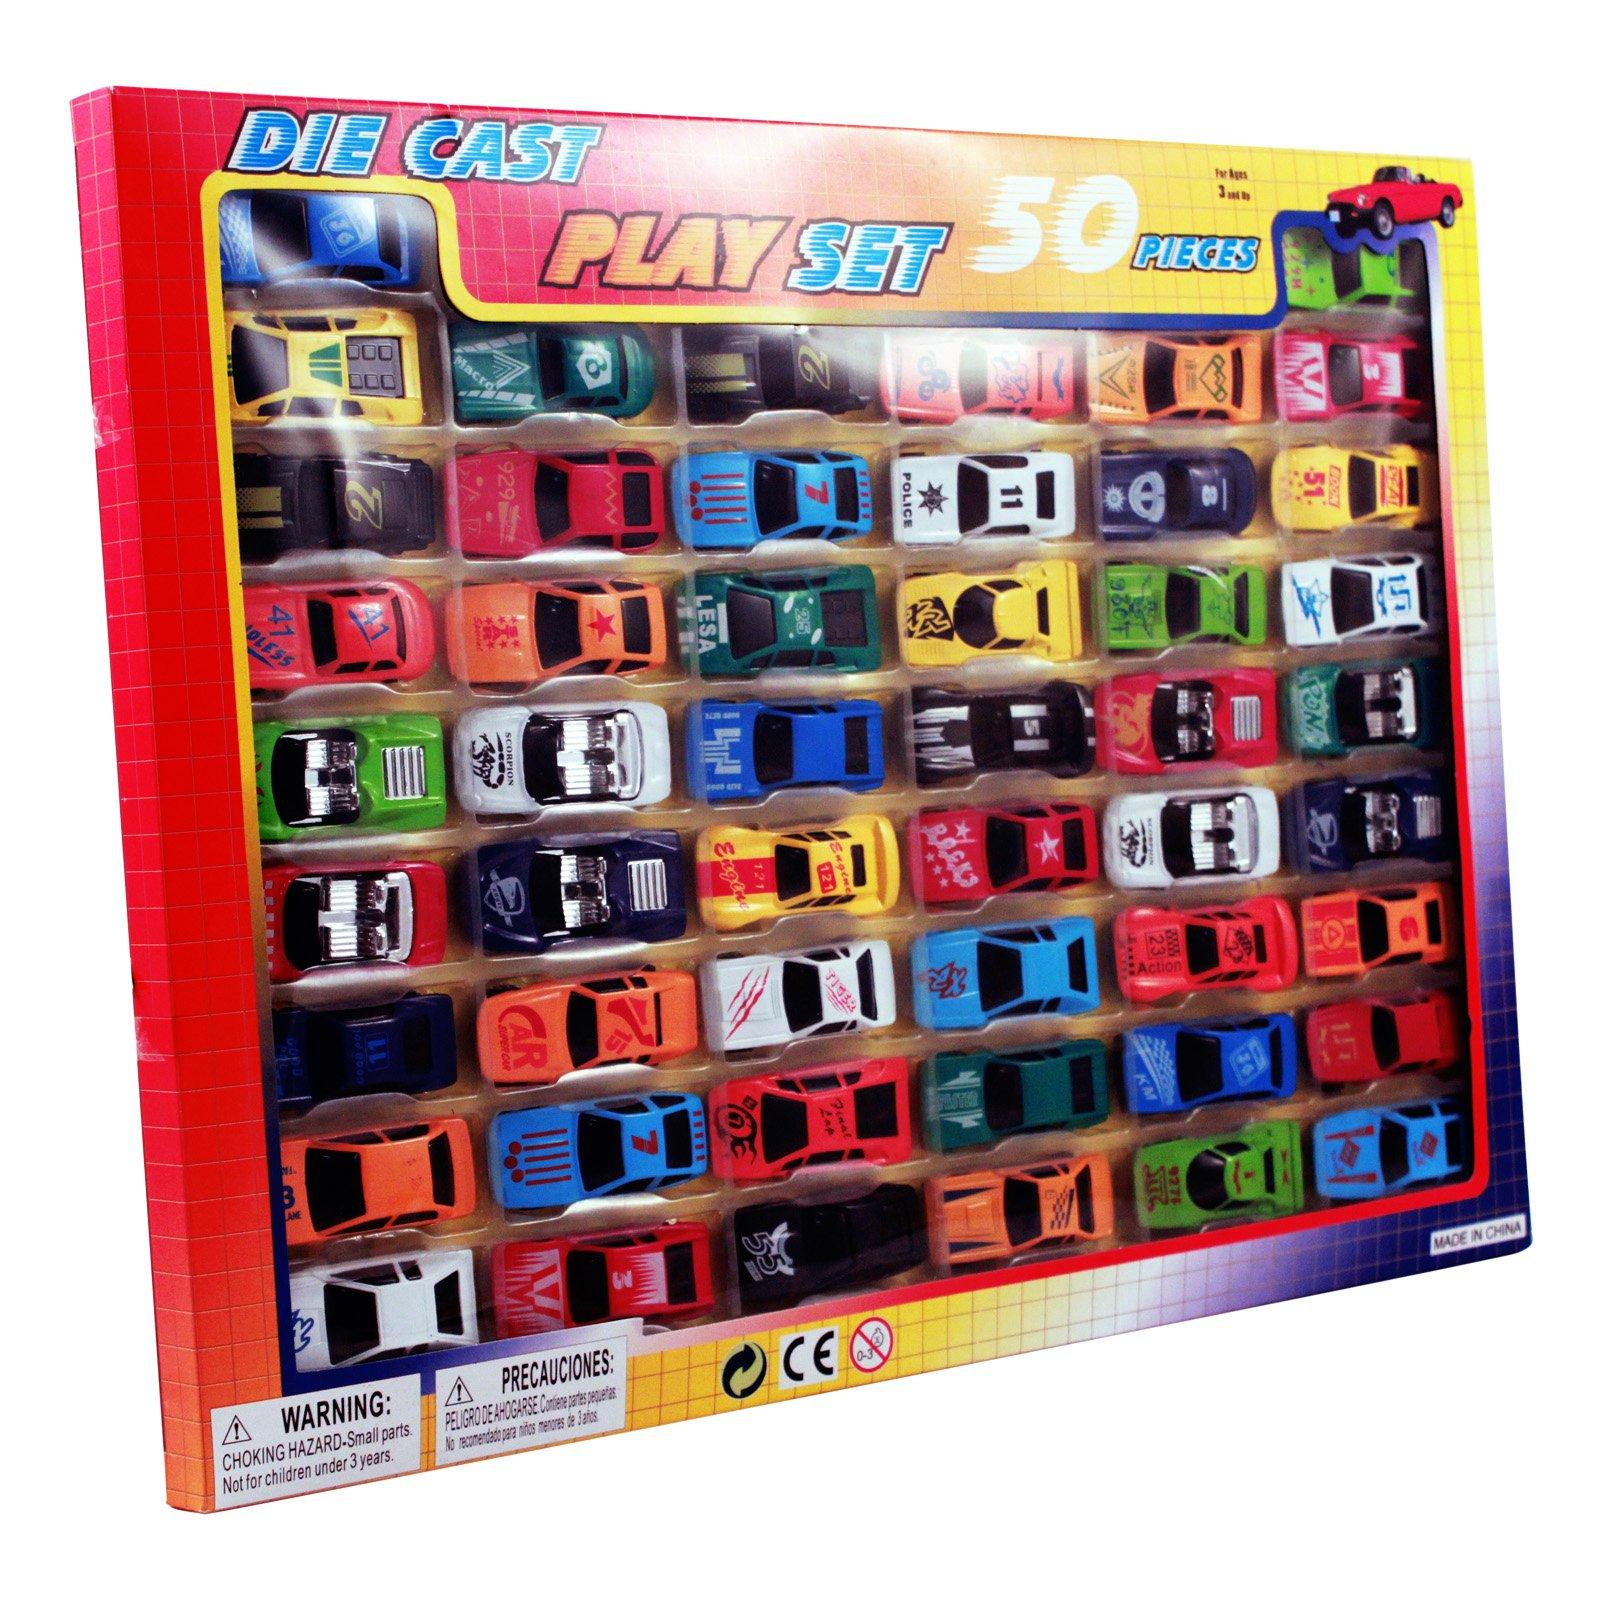 diecast retro toy car collection 50pc set retail view